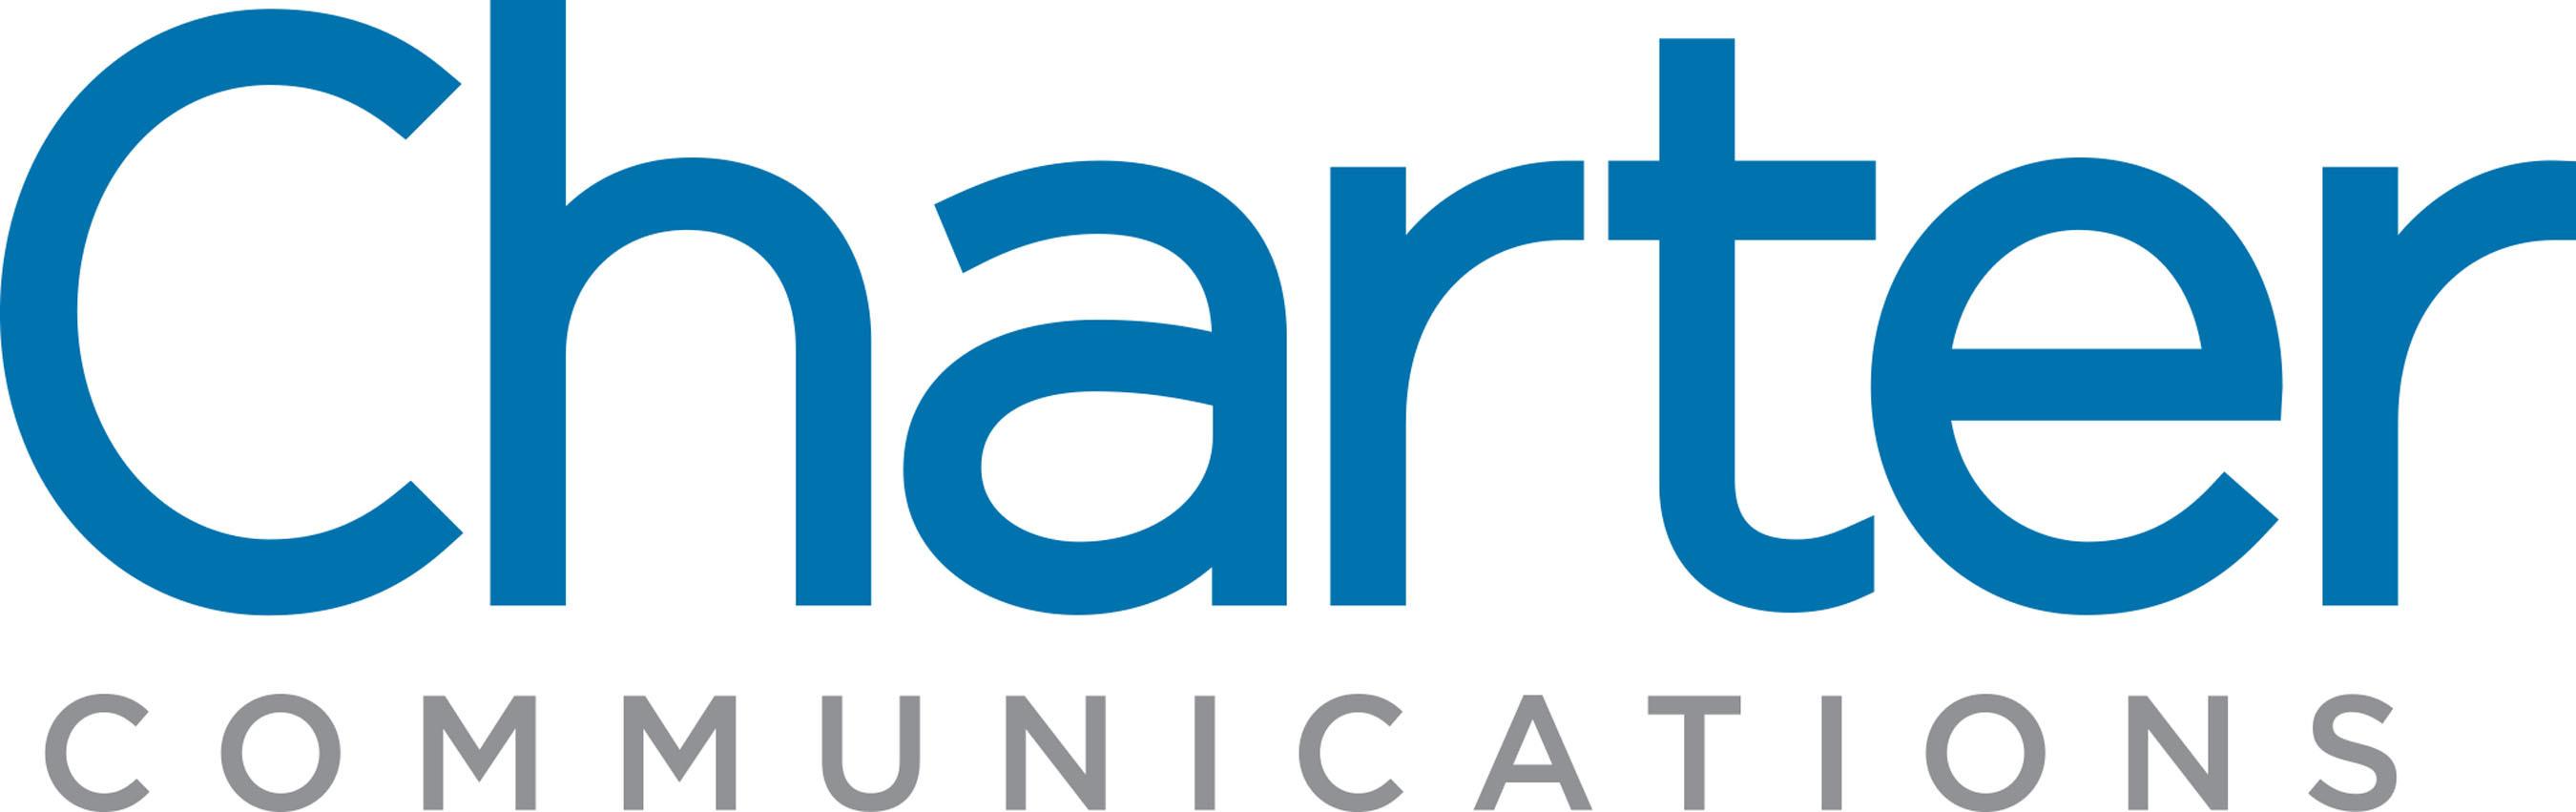 Spectrum Business Receives Mef Ce 20 Certification